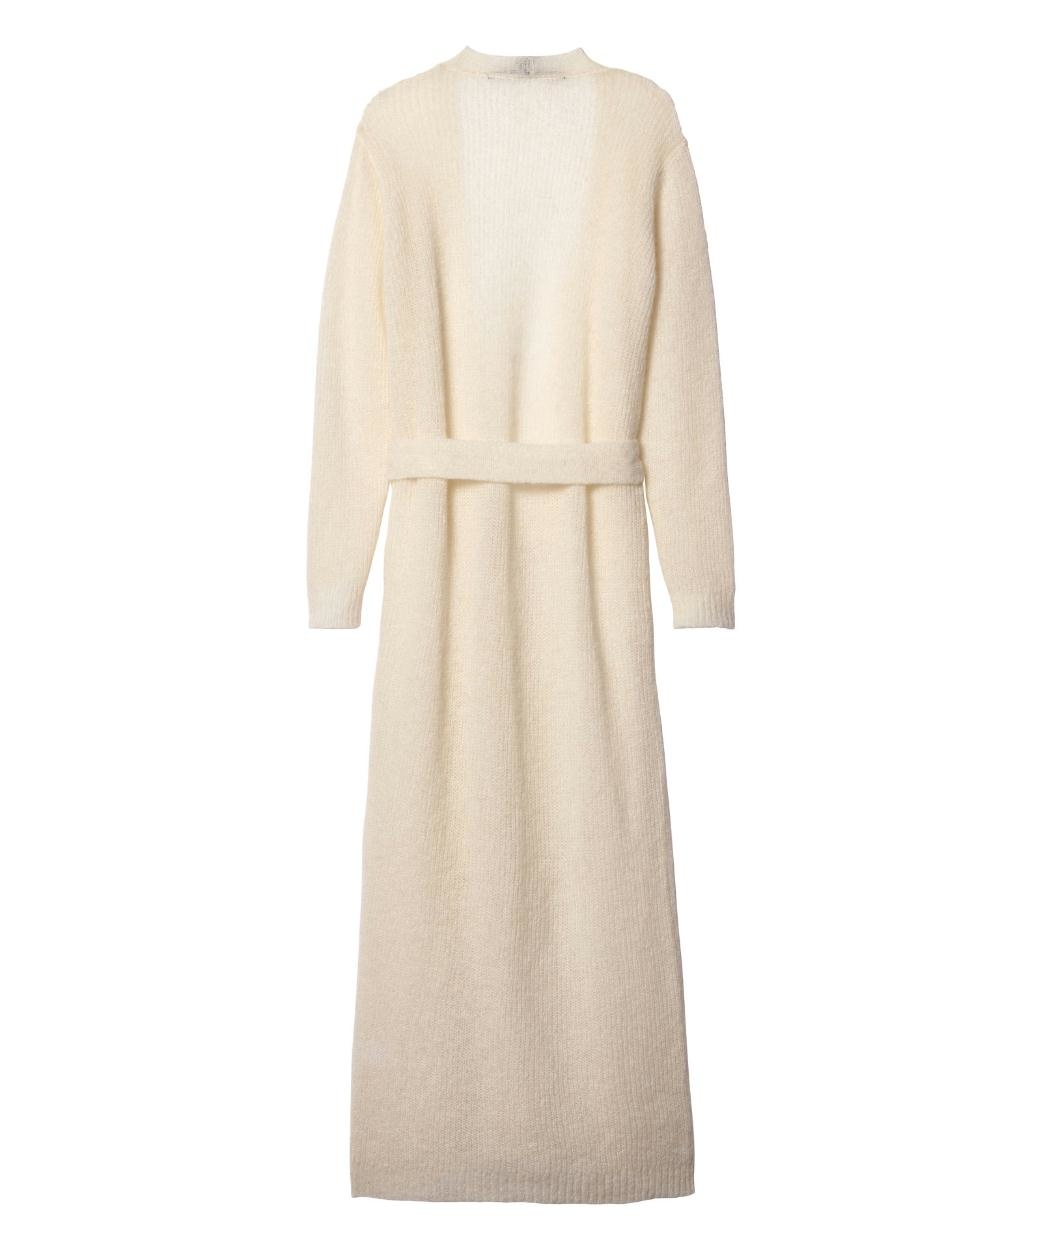 10Days Ecru Light Knit Cardigan 20.656.9103